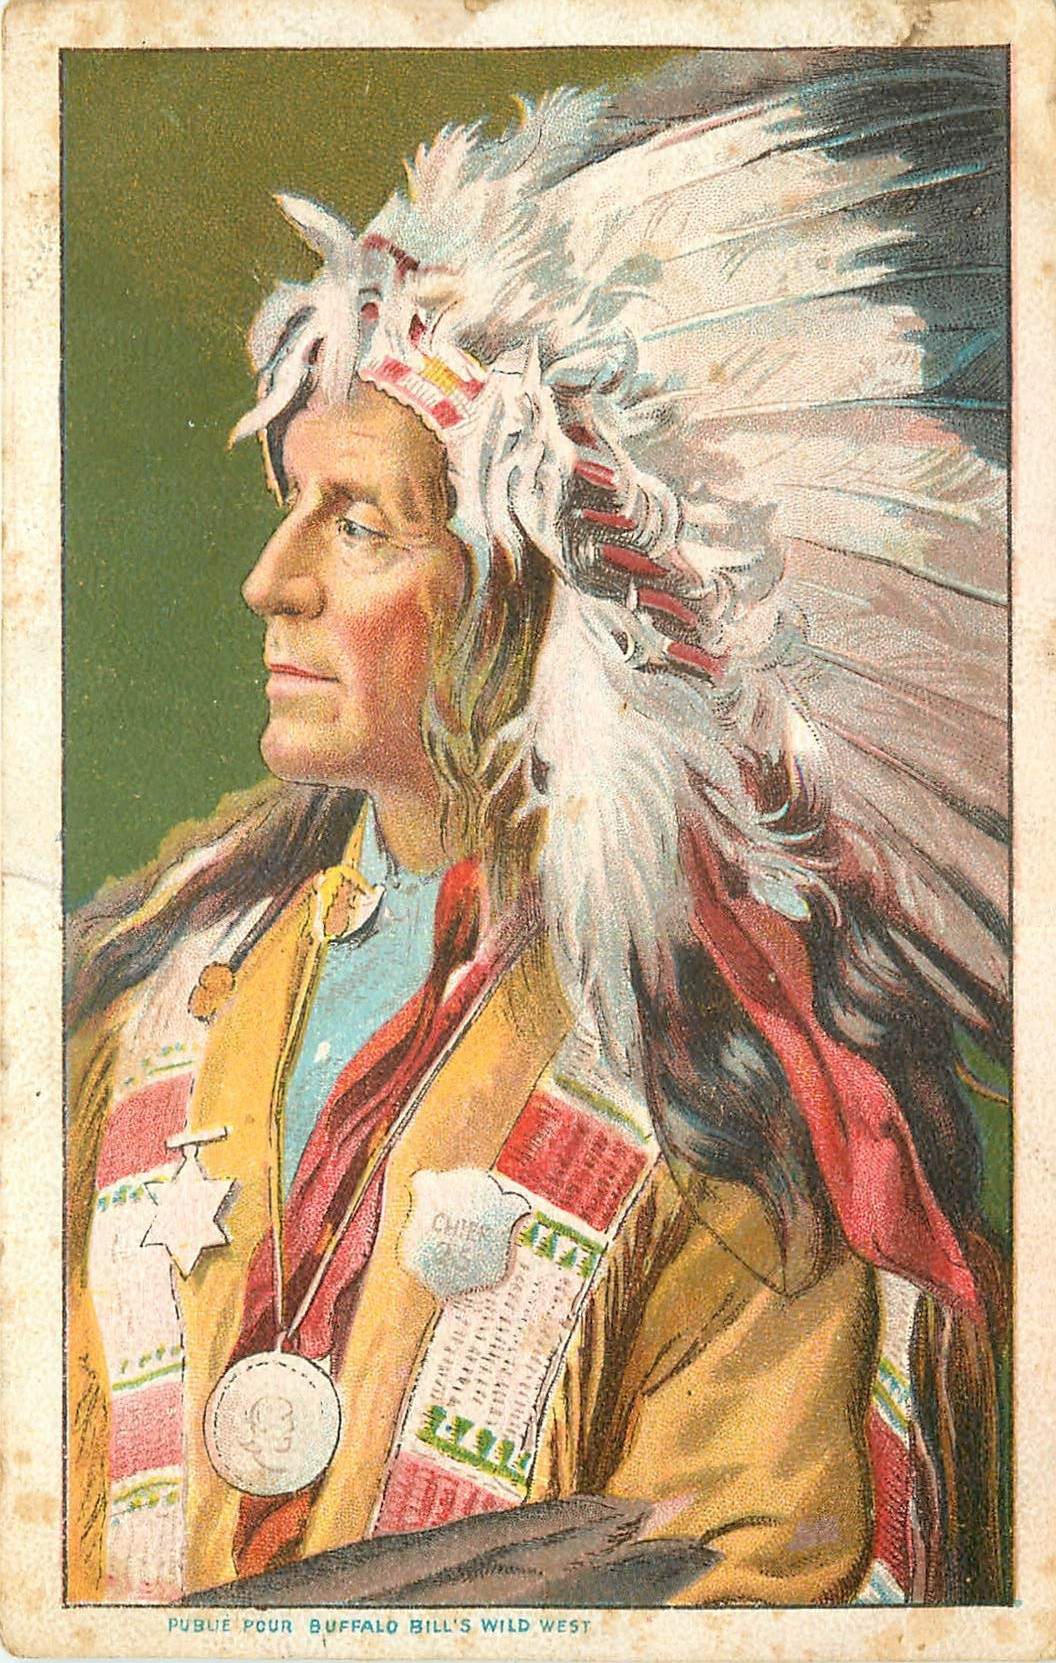 WW Cirque Spectacle. L'Indien par Buffalo Bill's 1905